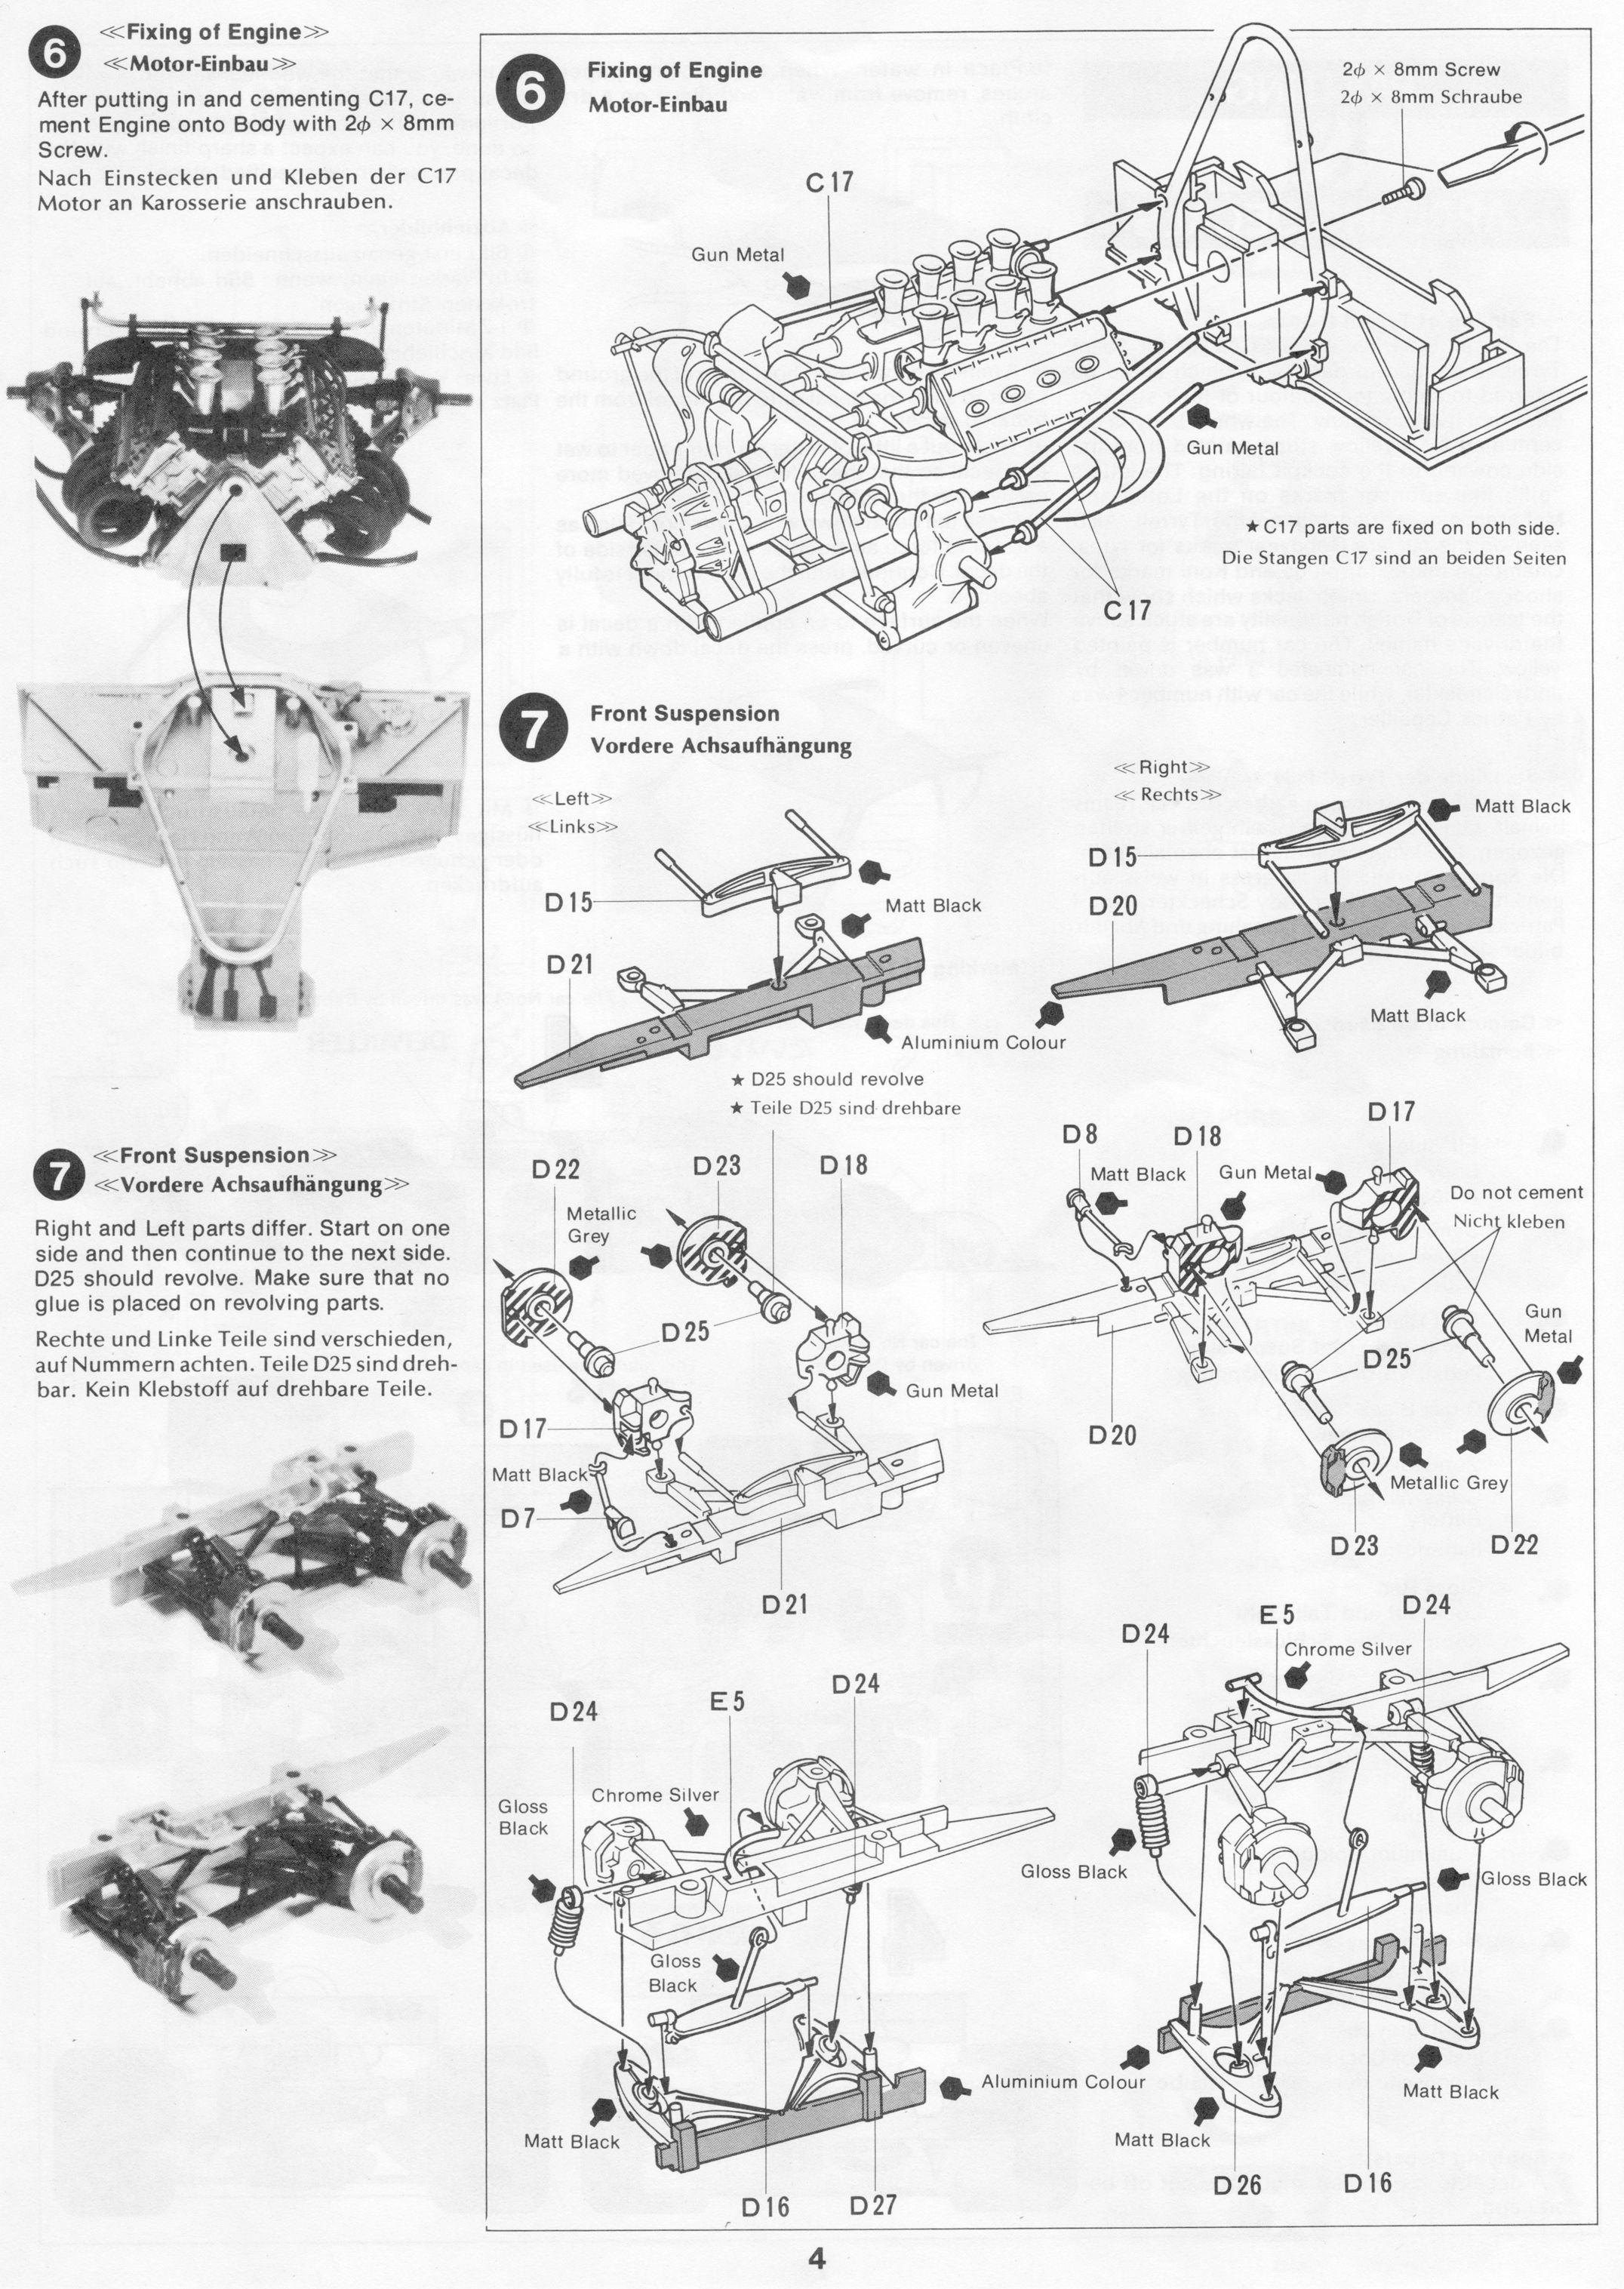 Pin By Gluefinger On Tamiya 1 20 Tyrrell P34 Sheet Music Tamiya Instruction